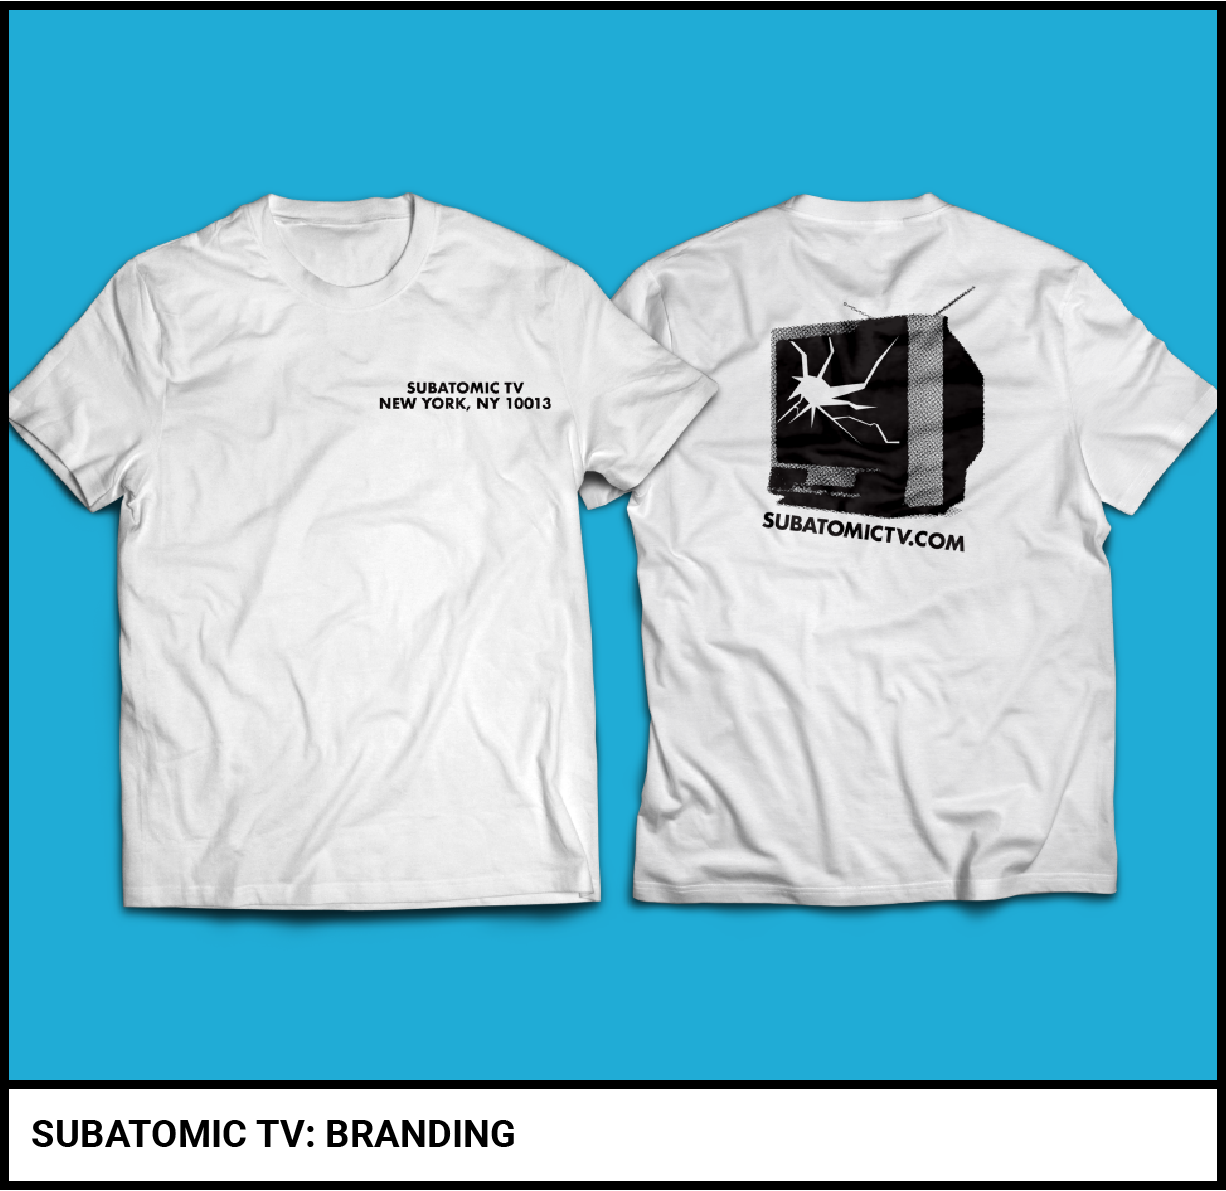 05_branding_subatomic-TV.png